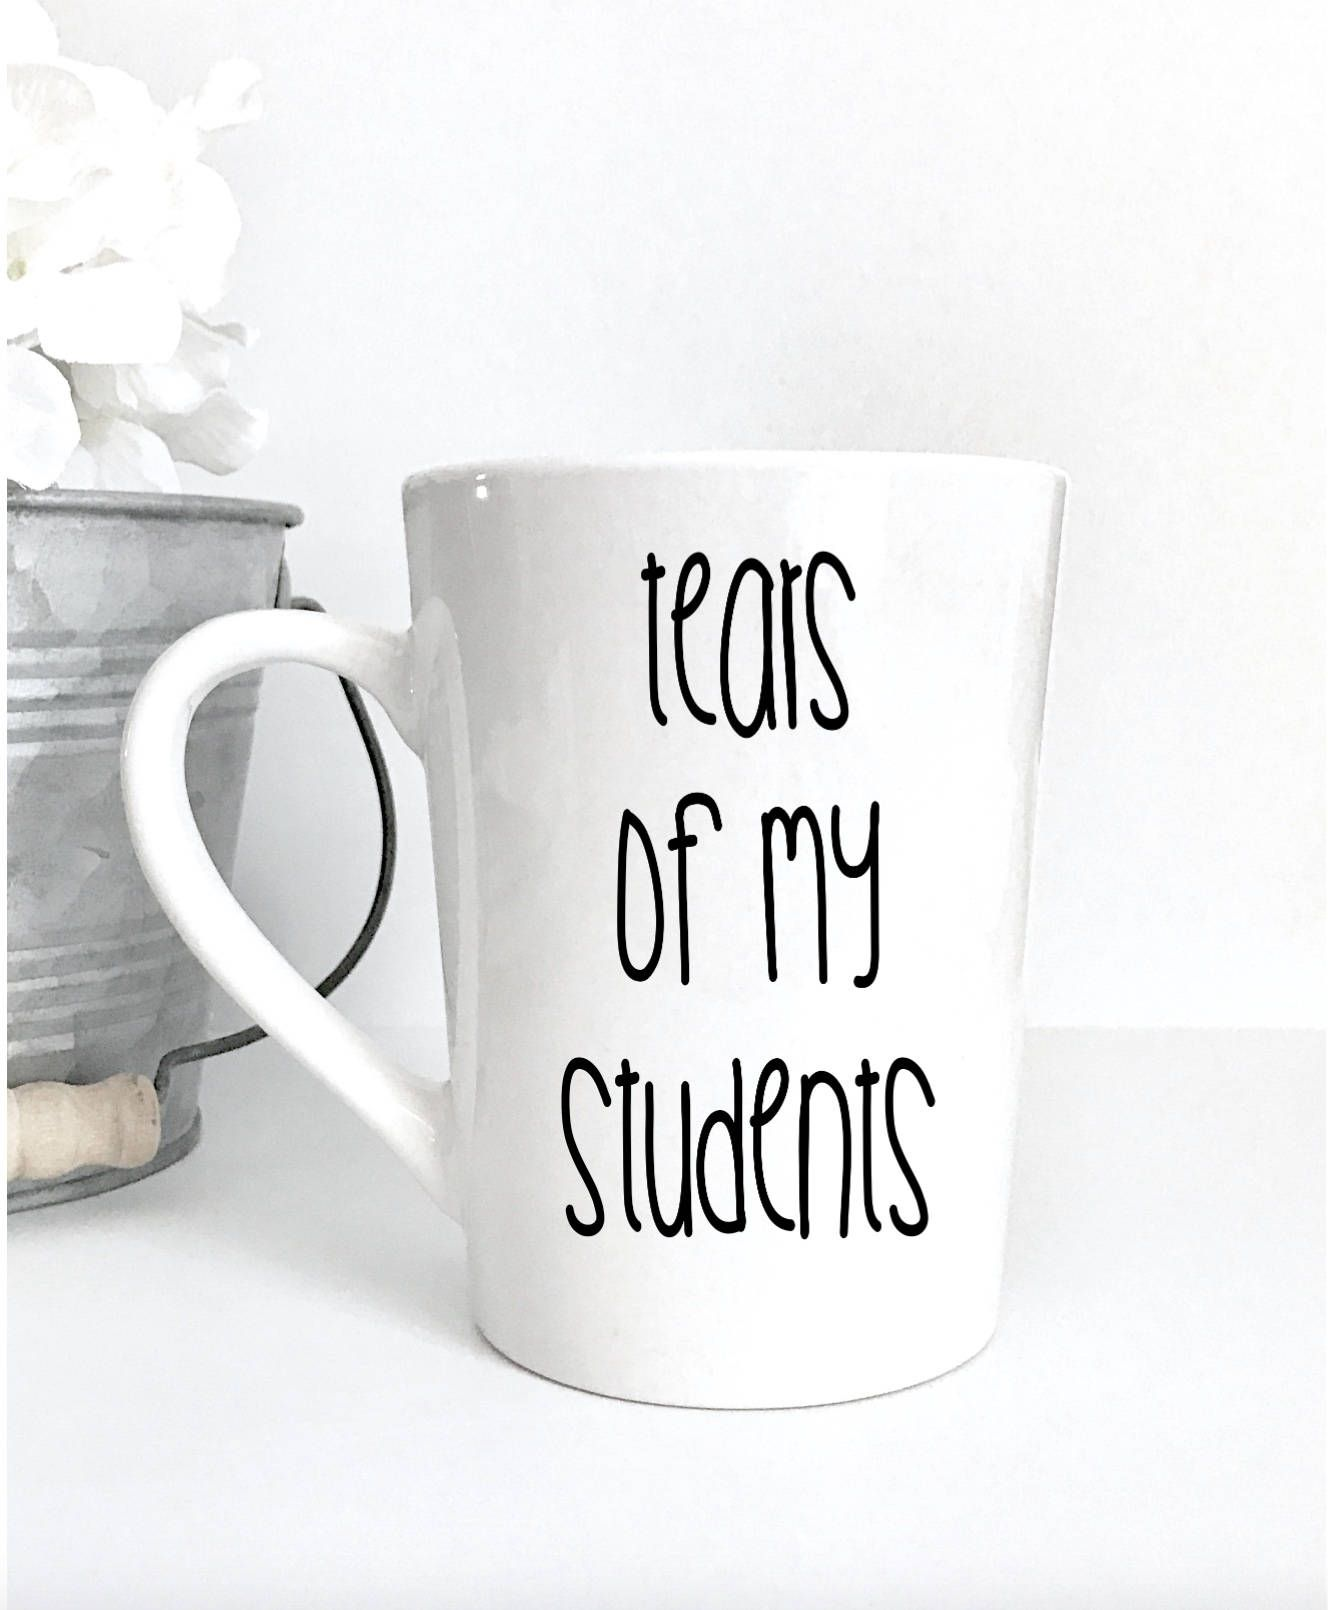 b1909e9257f Tears of my students, 14oz coffee mug, coffee cup, back to school, teacher  gift, teacher mug, last day of school, gifts under 25, funny mug by ...